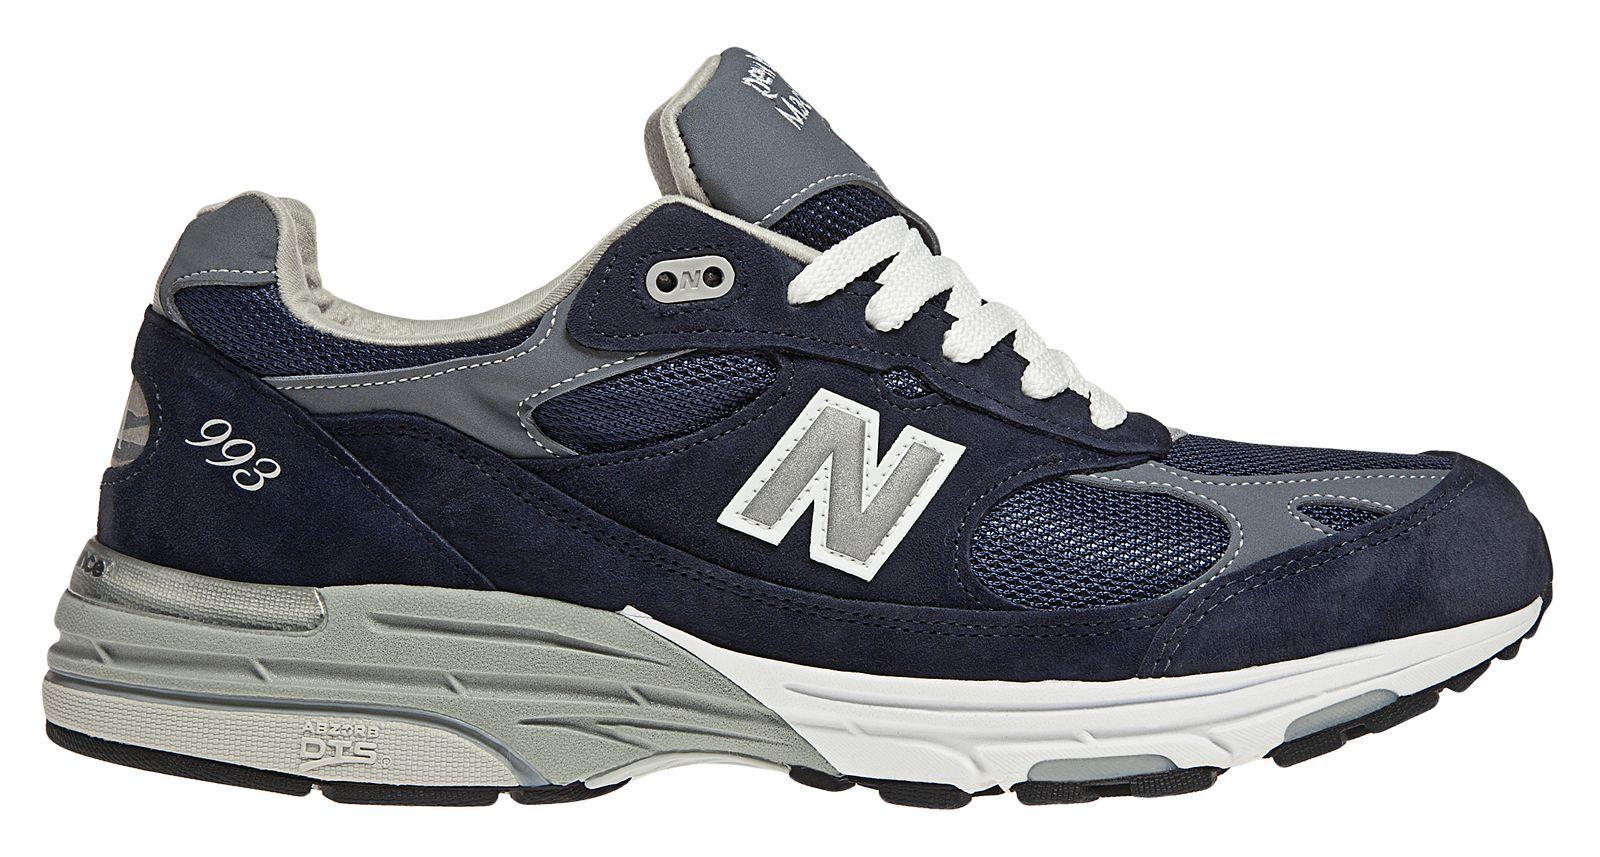 New Balance De Mujer Clásicos 993 Calzado Calzado Calzado para Correr Azul  Precio por piso